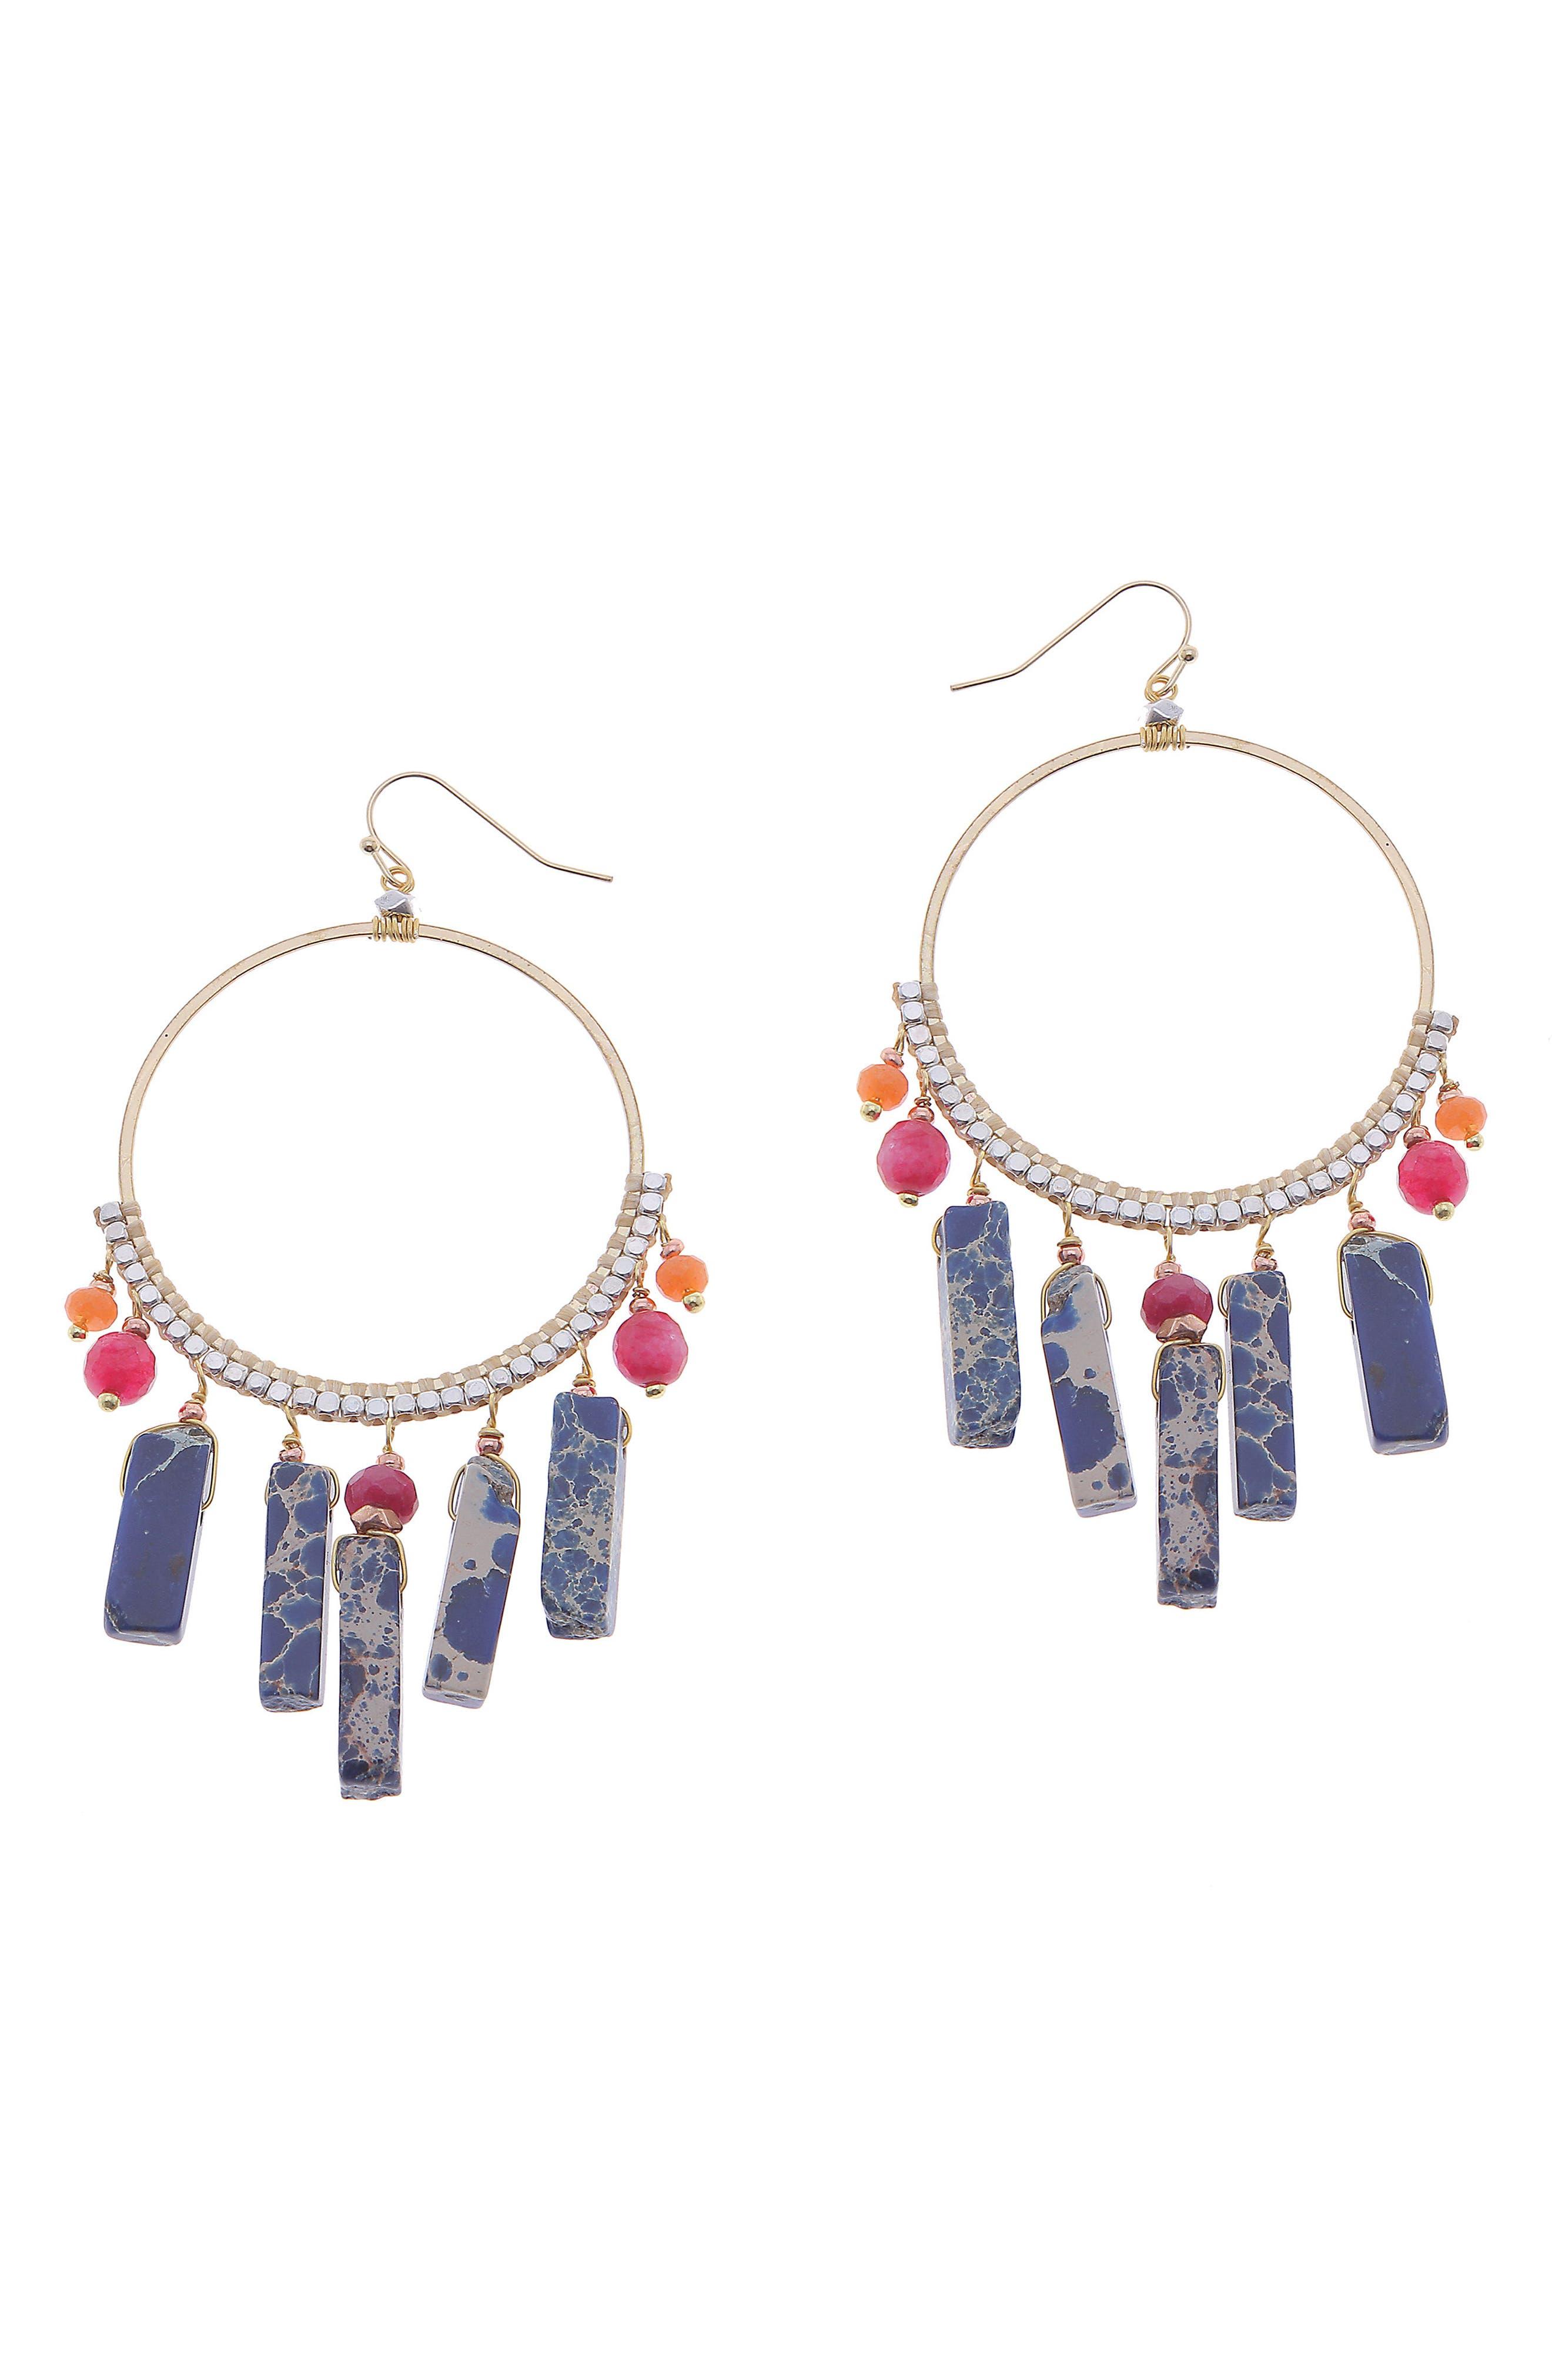 Raw Crystal & Cultured Pearl Hoop Earrings,                             Main thumbnail 1, color,                             Blue/ Multi